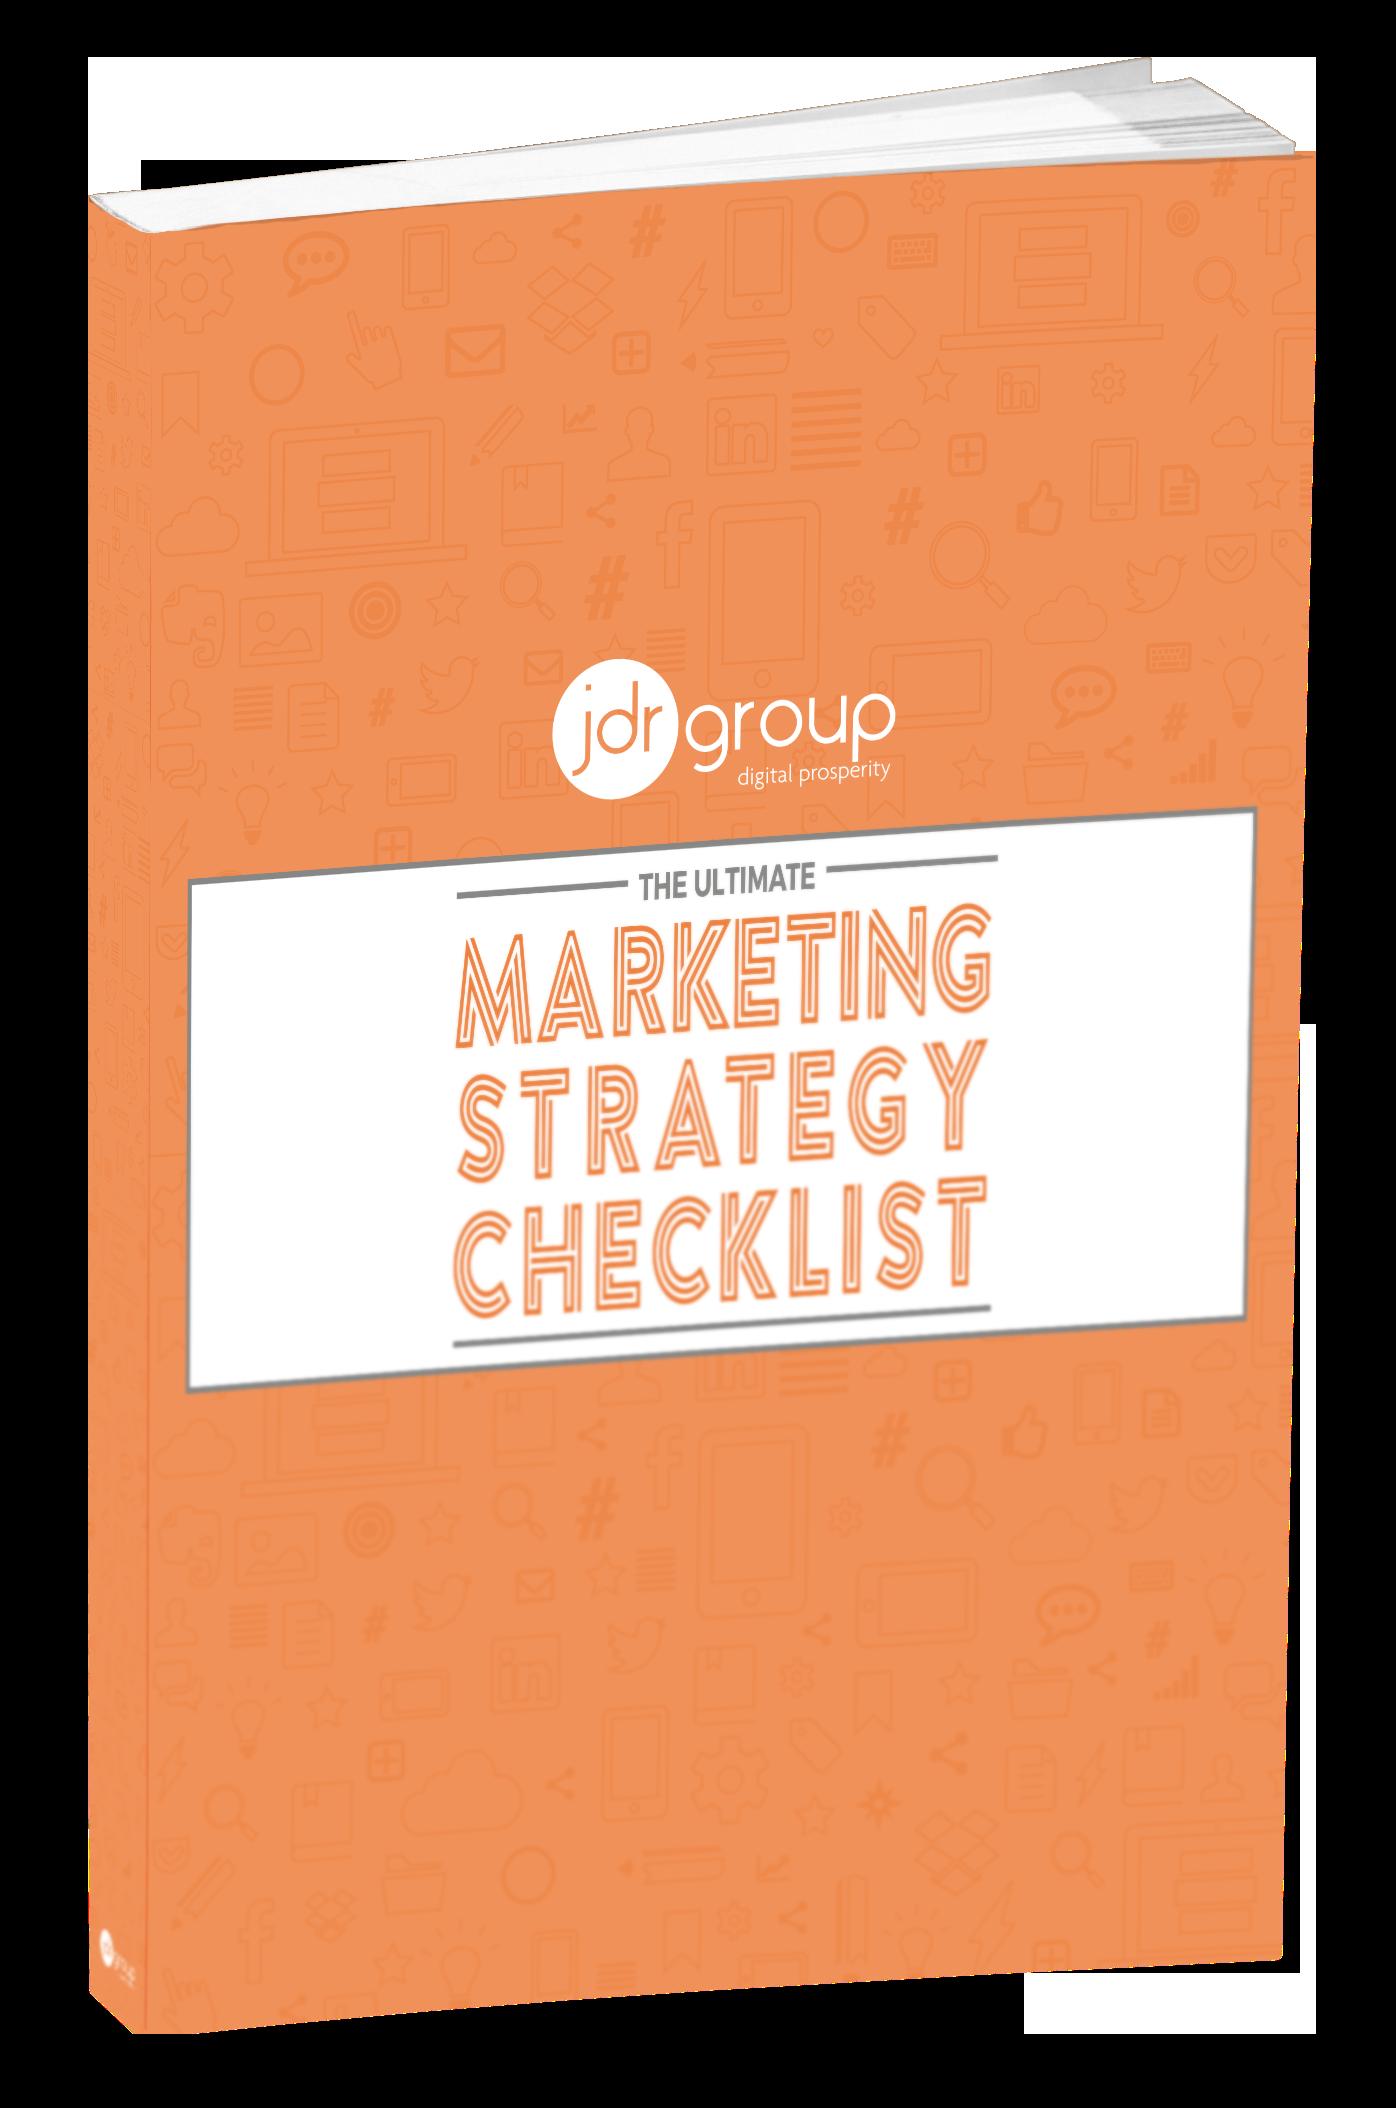 Ebook-Cover-JDR-Marketing-Strategy-Checklist-6